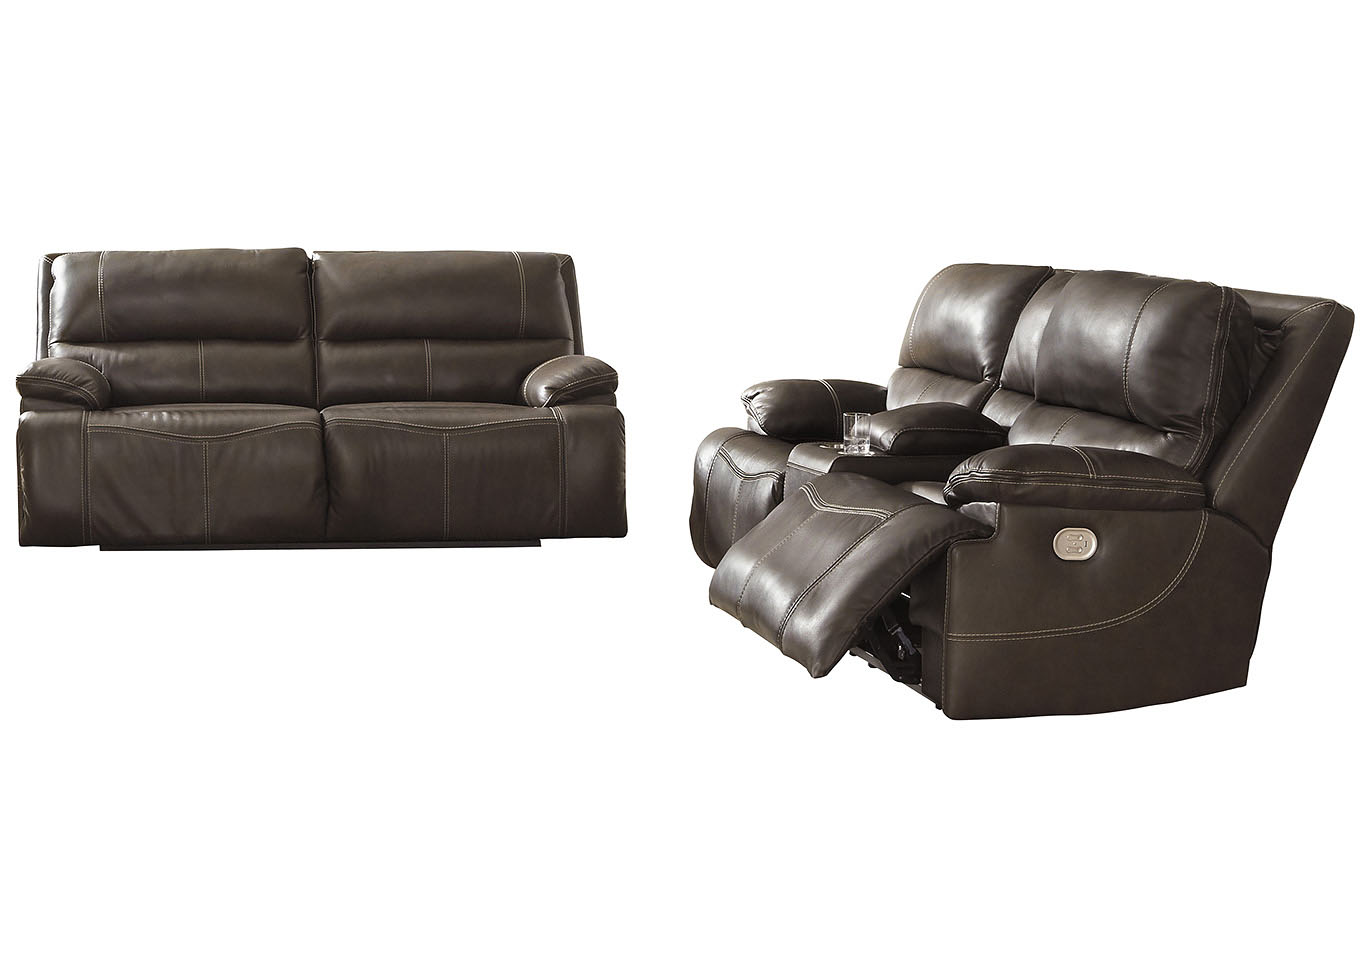 Excellent Ivan Smith Ricmen Walnut Power Reclining Sofa And Loveseat Ibusinesslaw Wood Chair Design Ideas Ibusinesslaworg